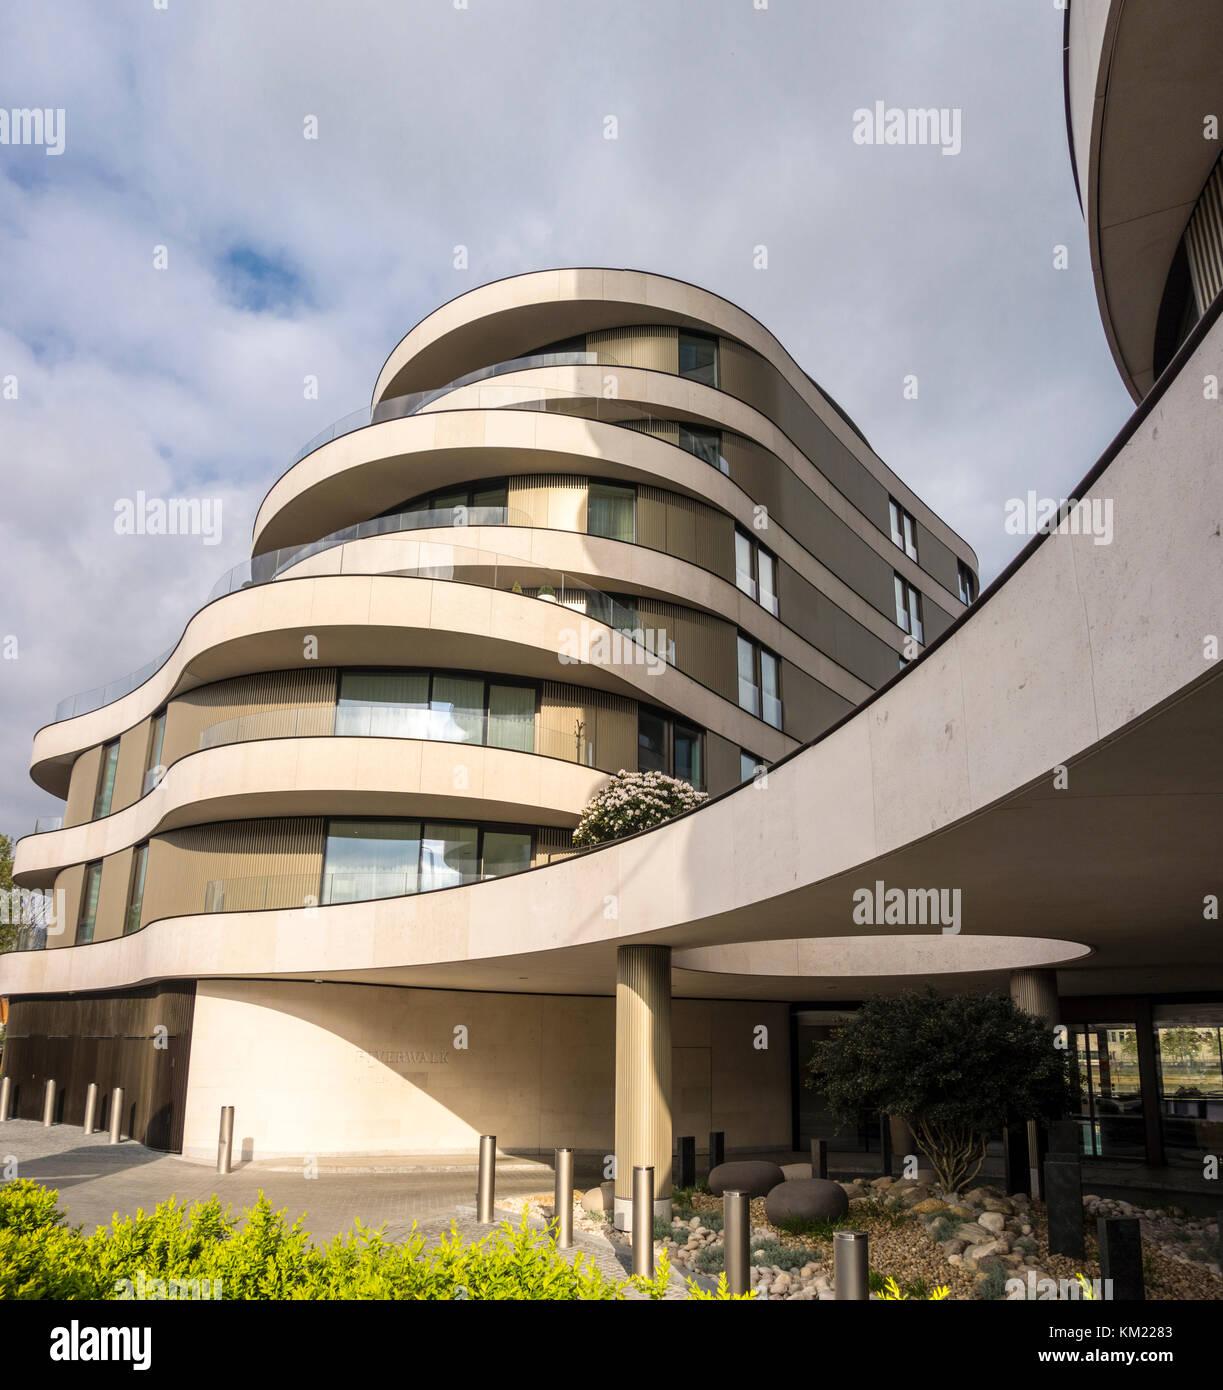 Riverwalk Apartments, Milbank, Westminster, London, UK Photo Stock